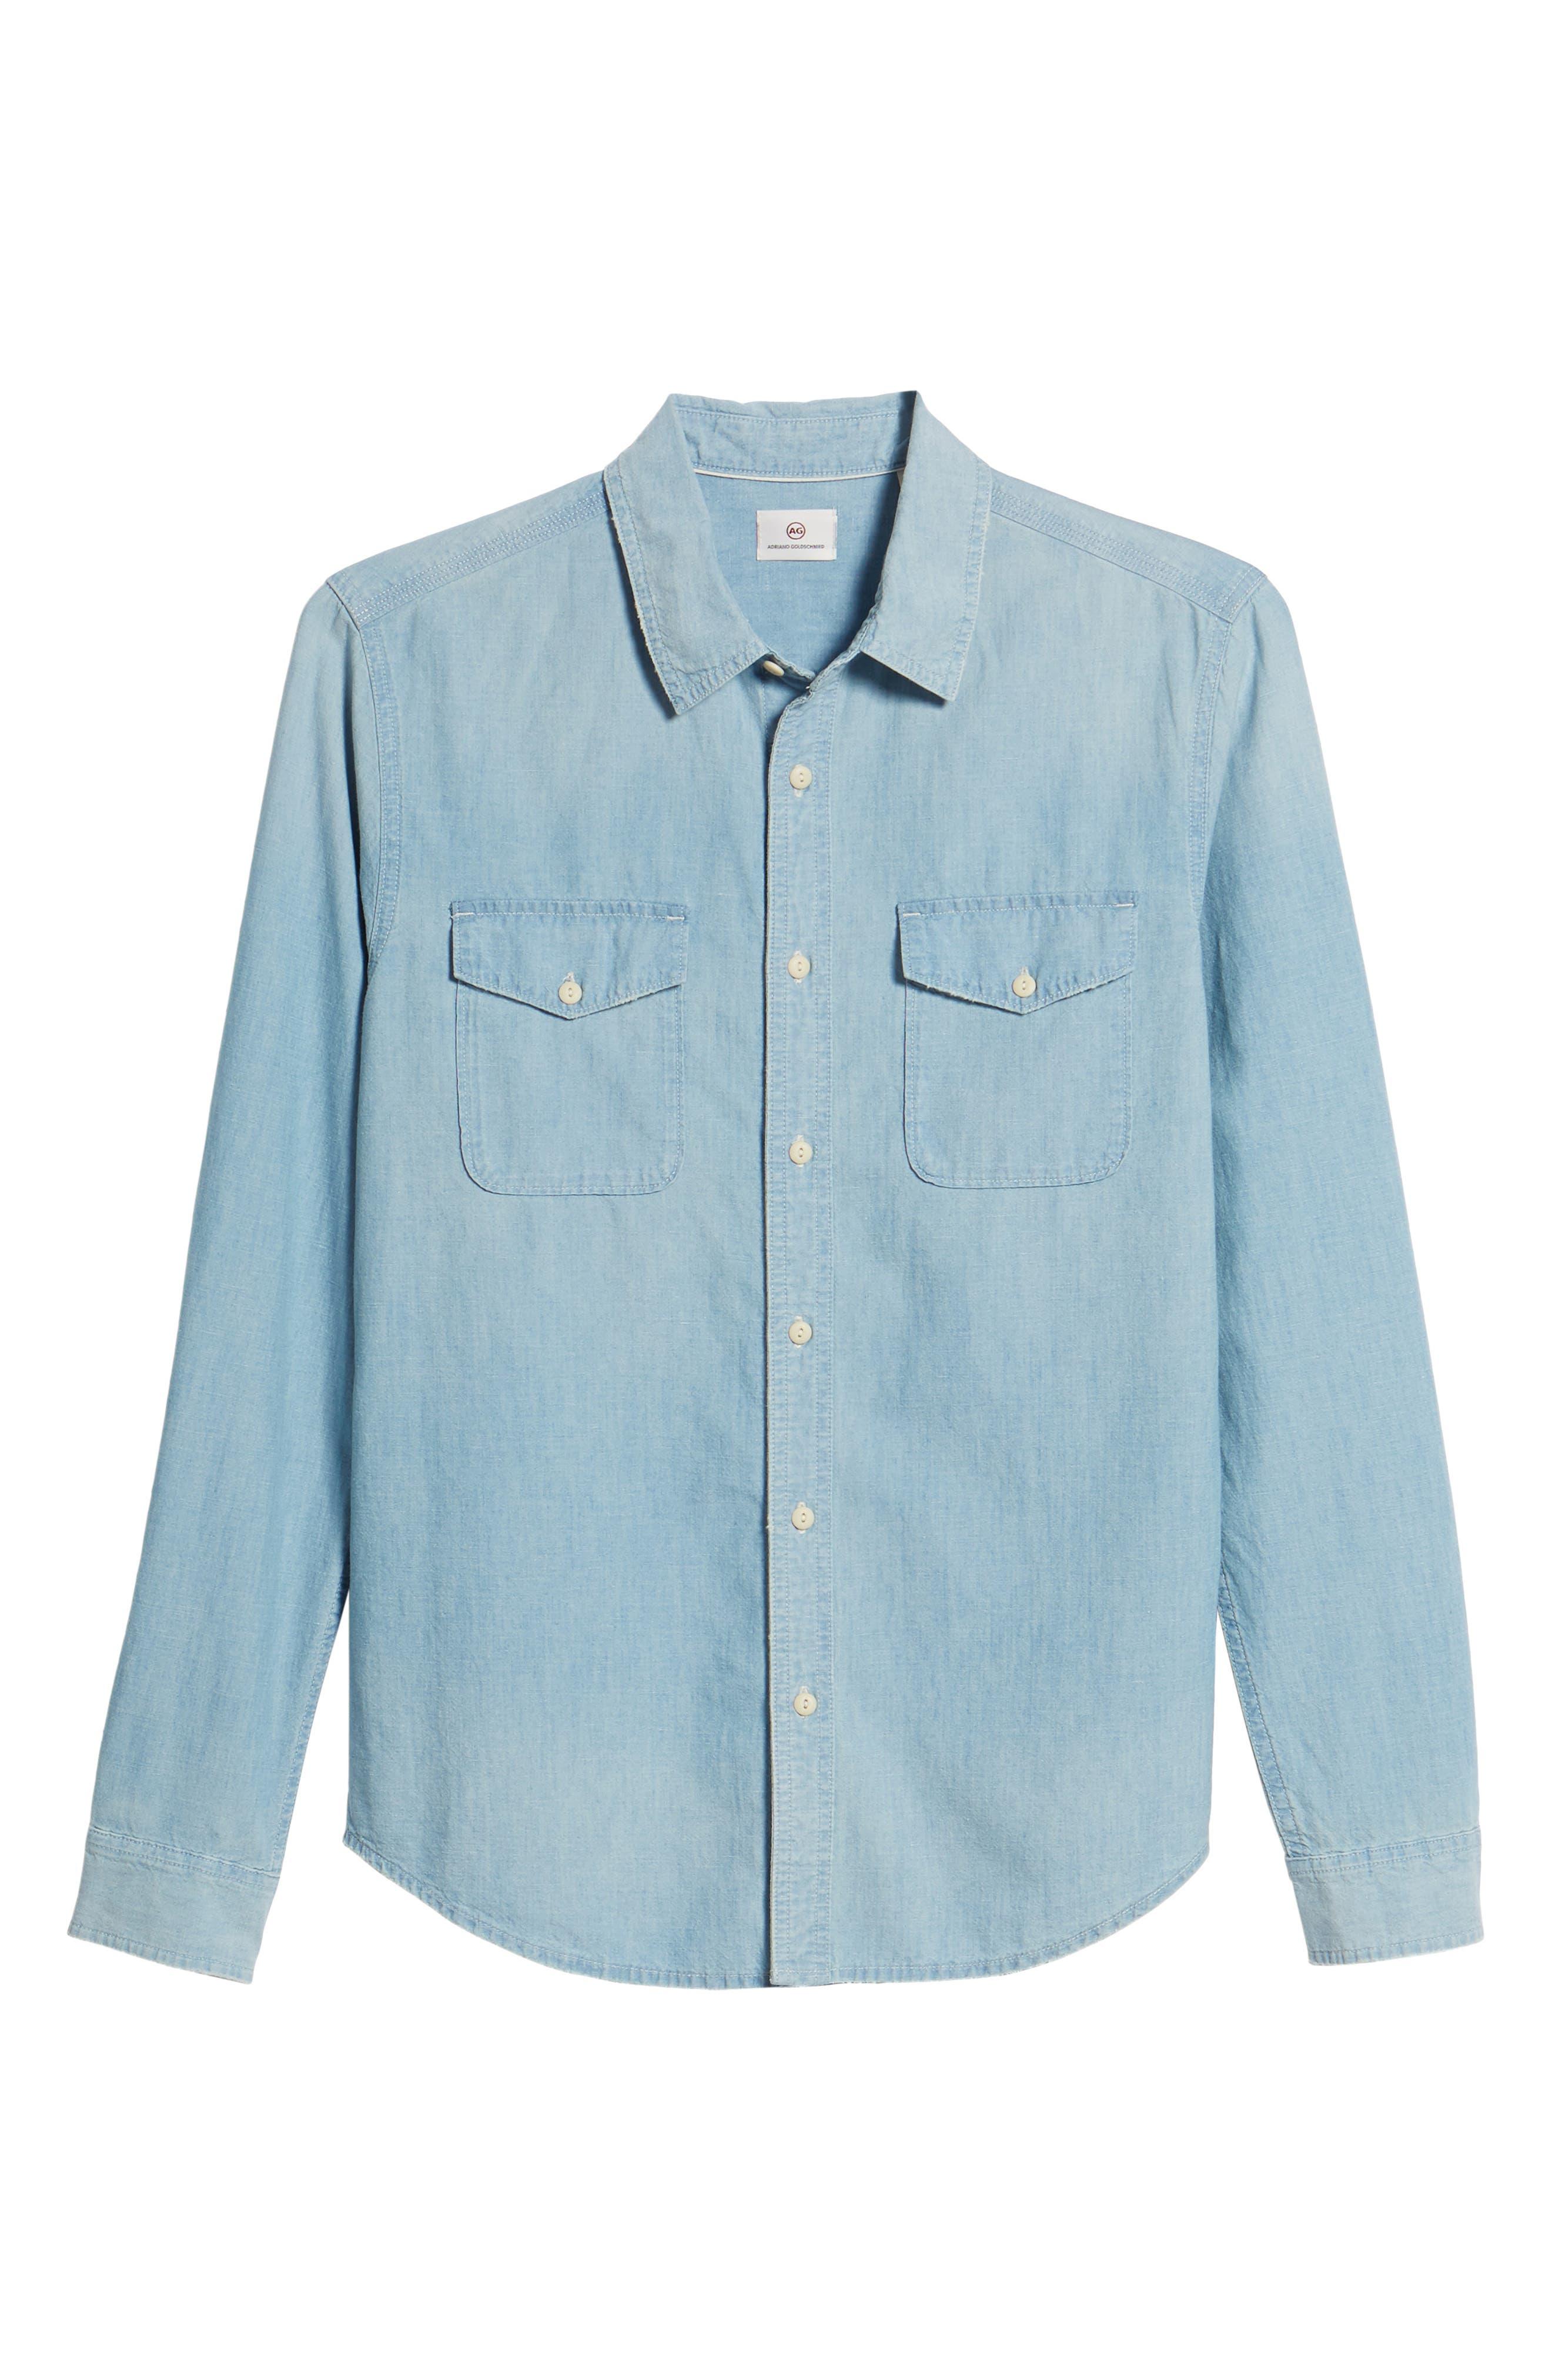 Benning Regular Fit Sport Shirt,                             Alternate thumbnail 6, color,                             Roadstead